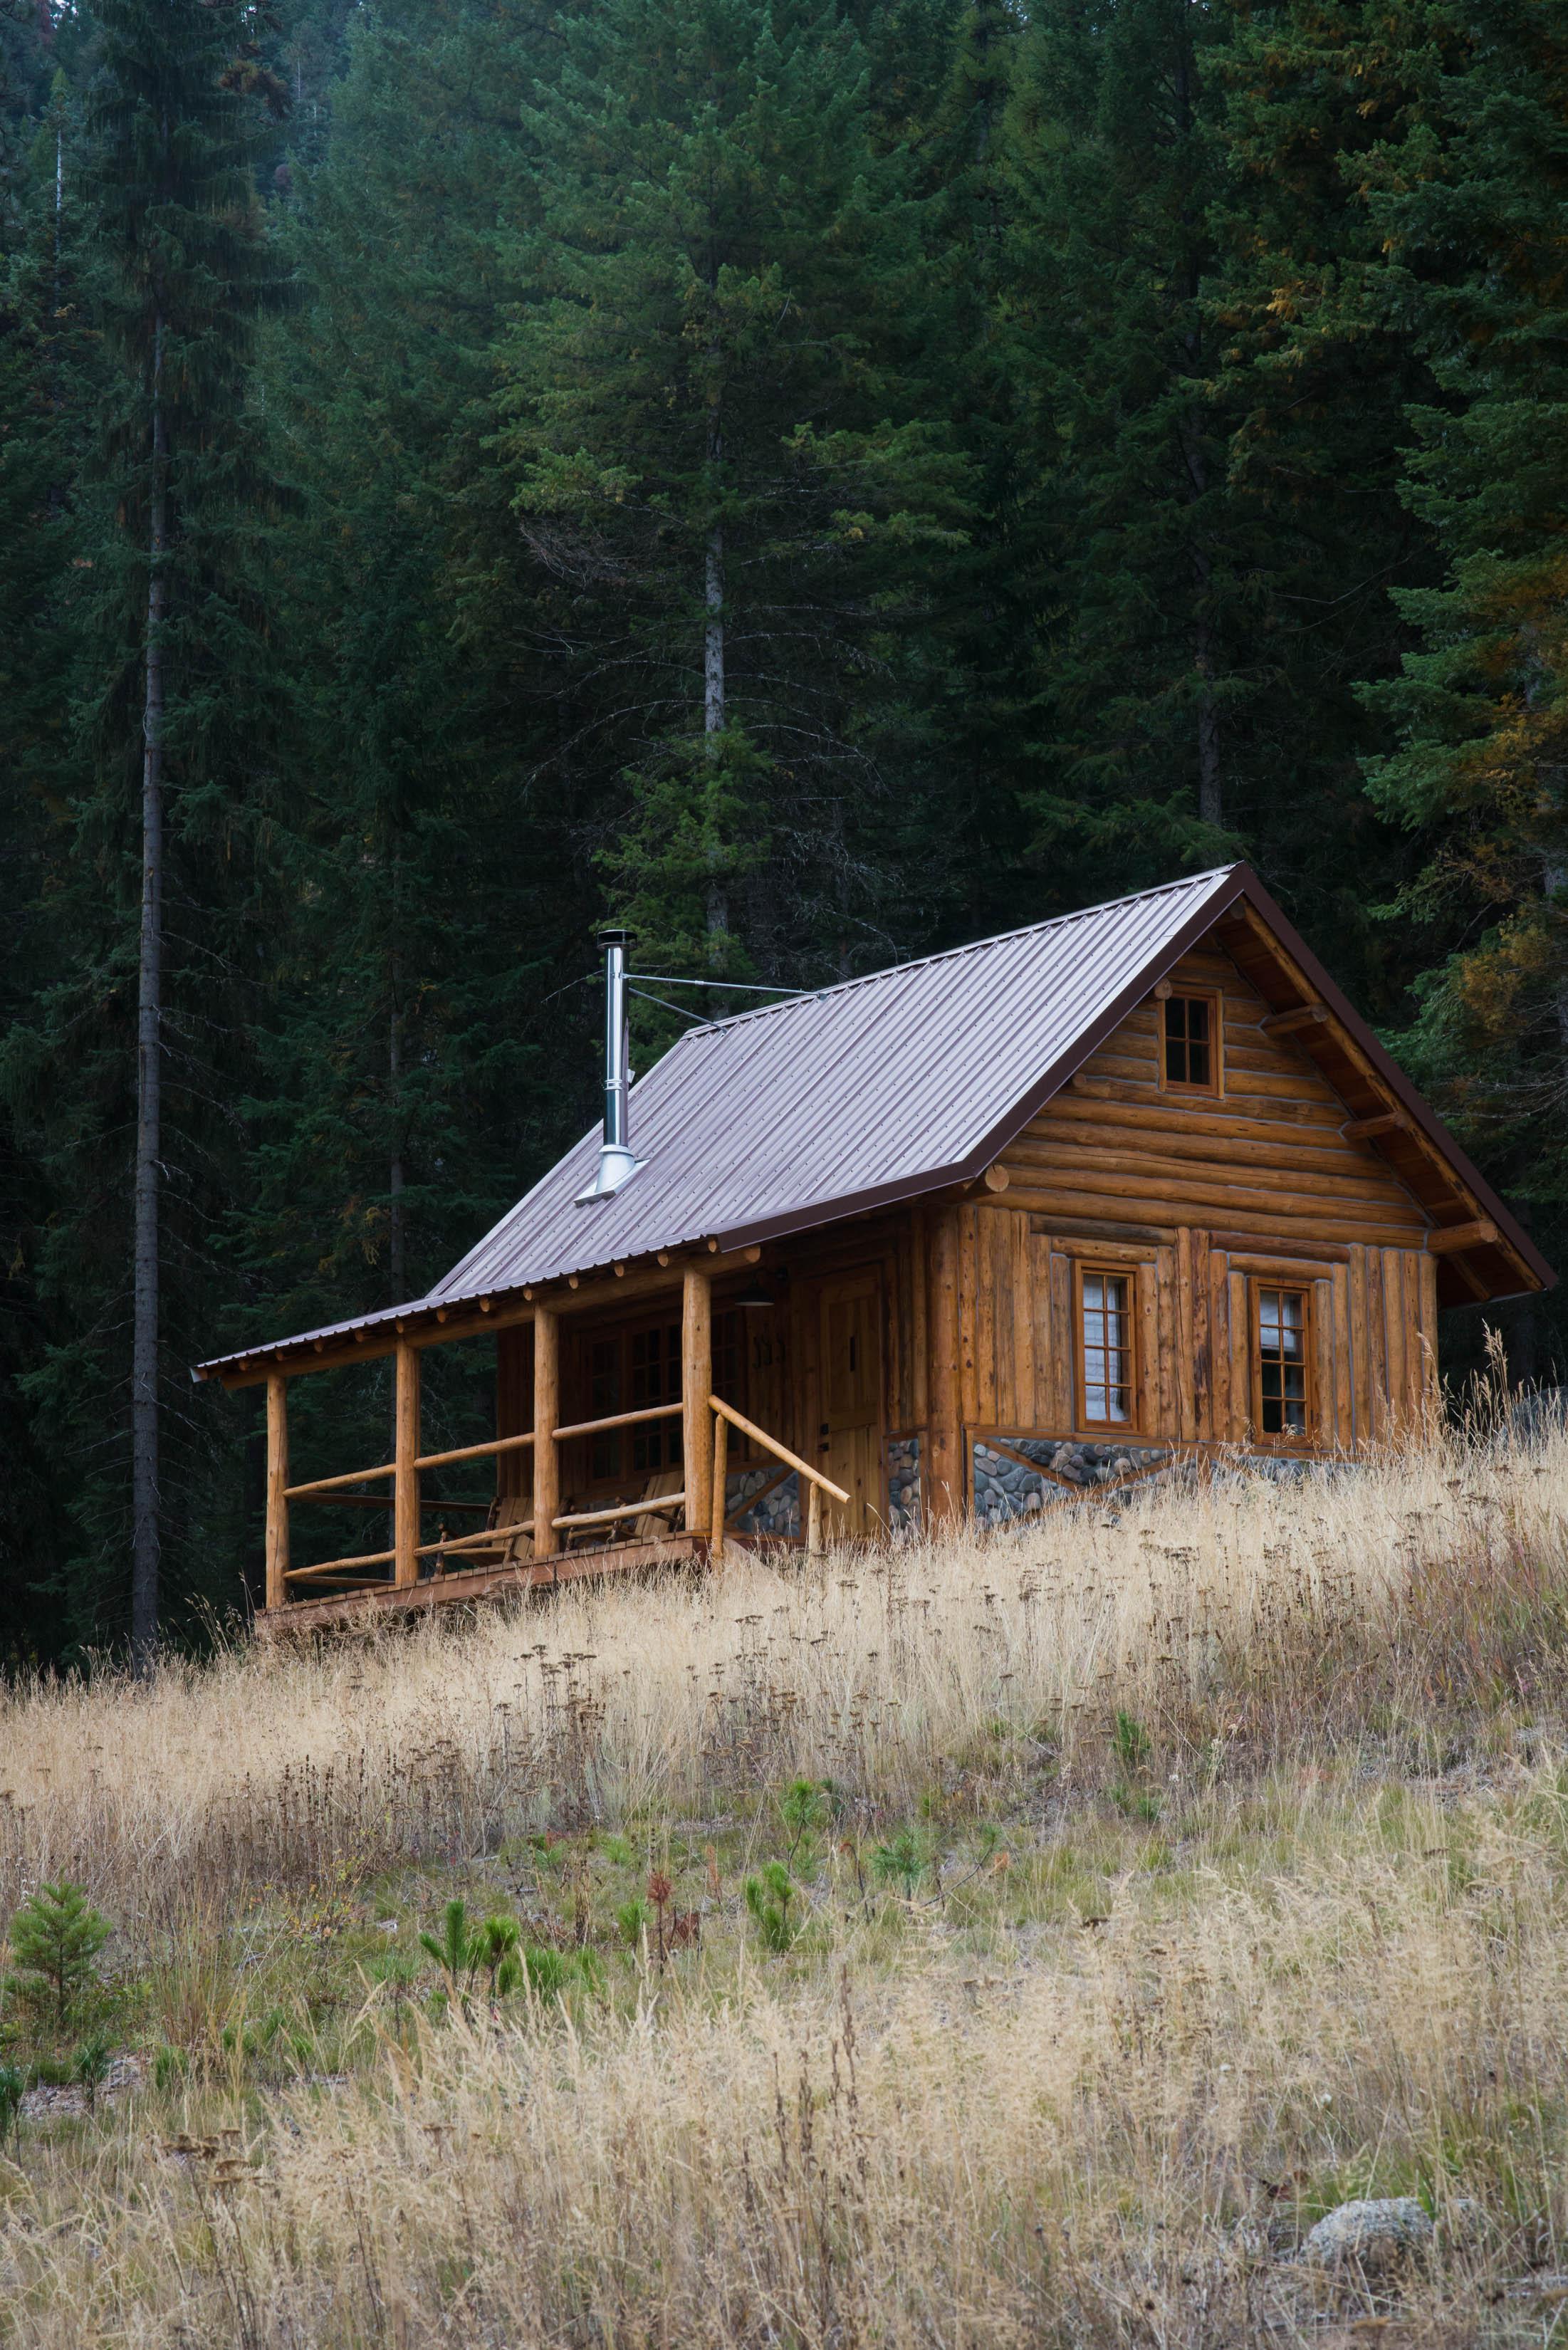 Minam_River_Lodge_Wallowa_Mountains_Eagle_Cap_Wilderness_Oregon_Autumn_2017_Please_Credit_Talia_Jean_Galvin-64.jpg